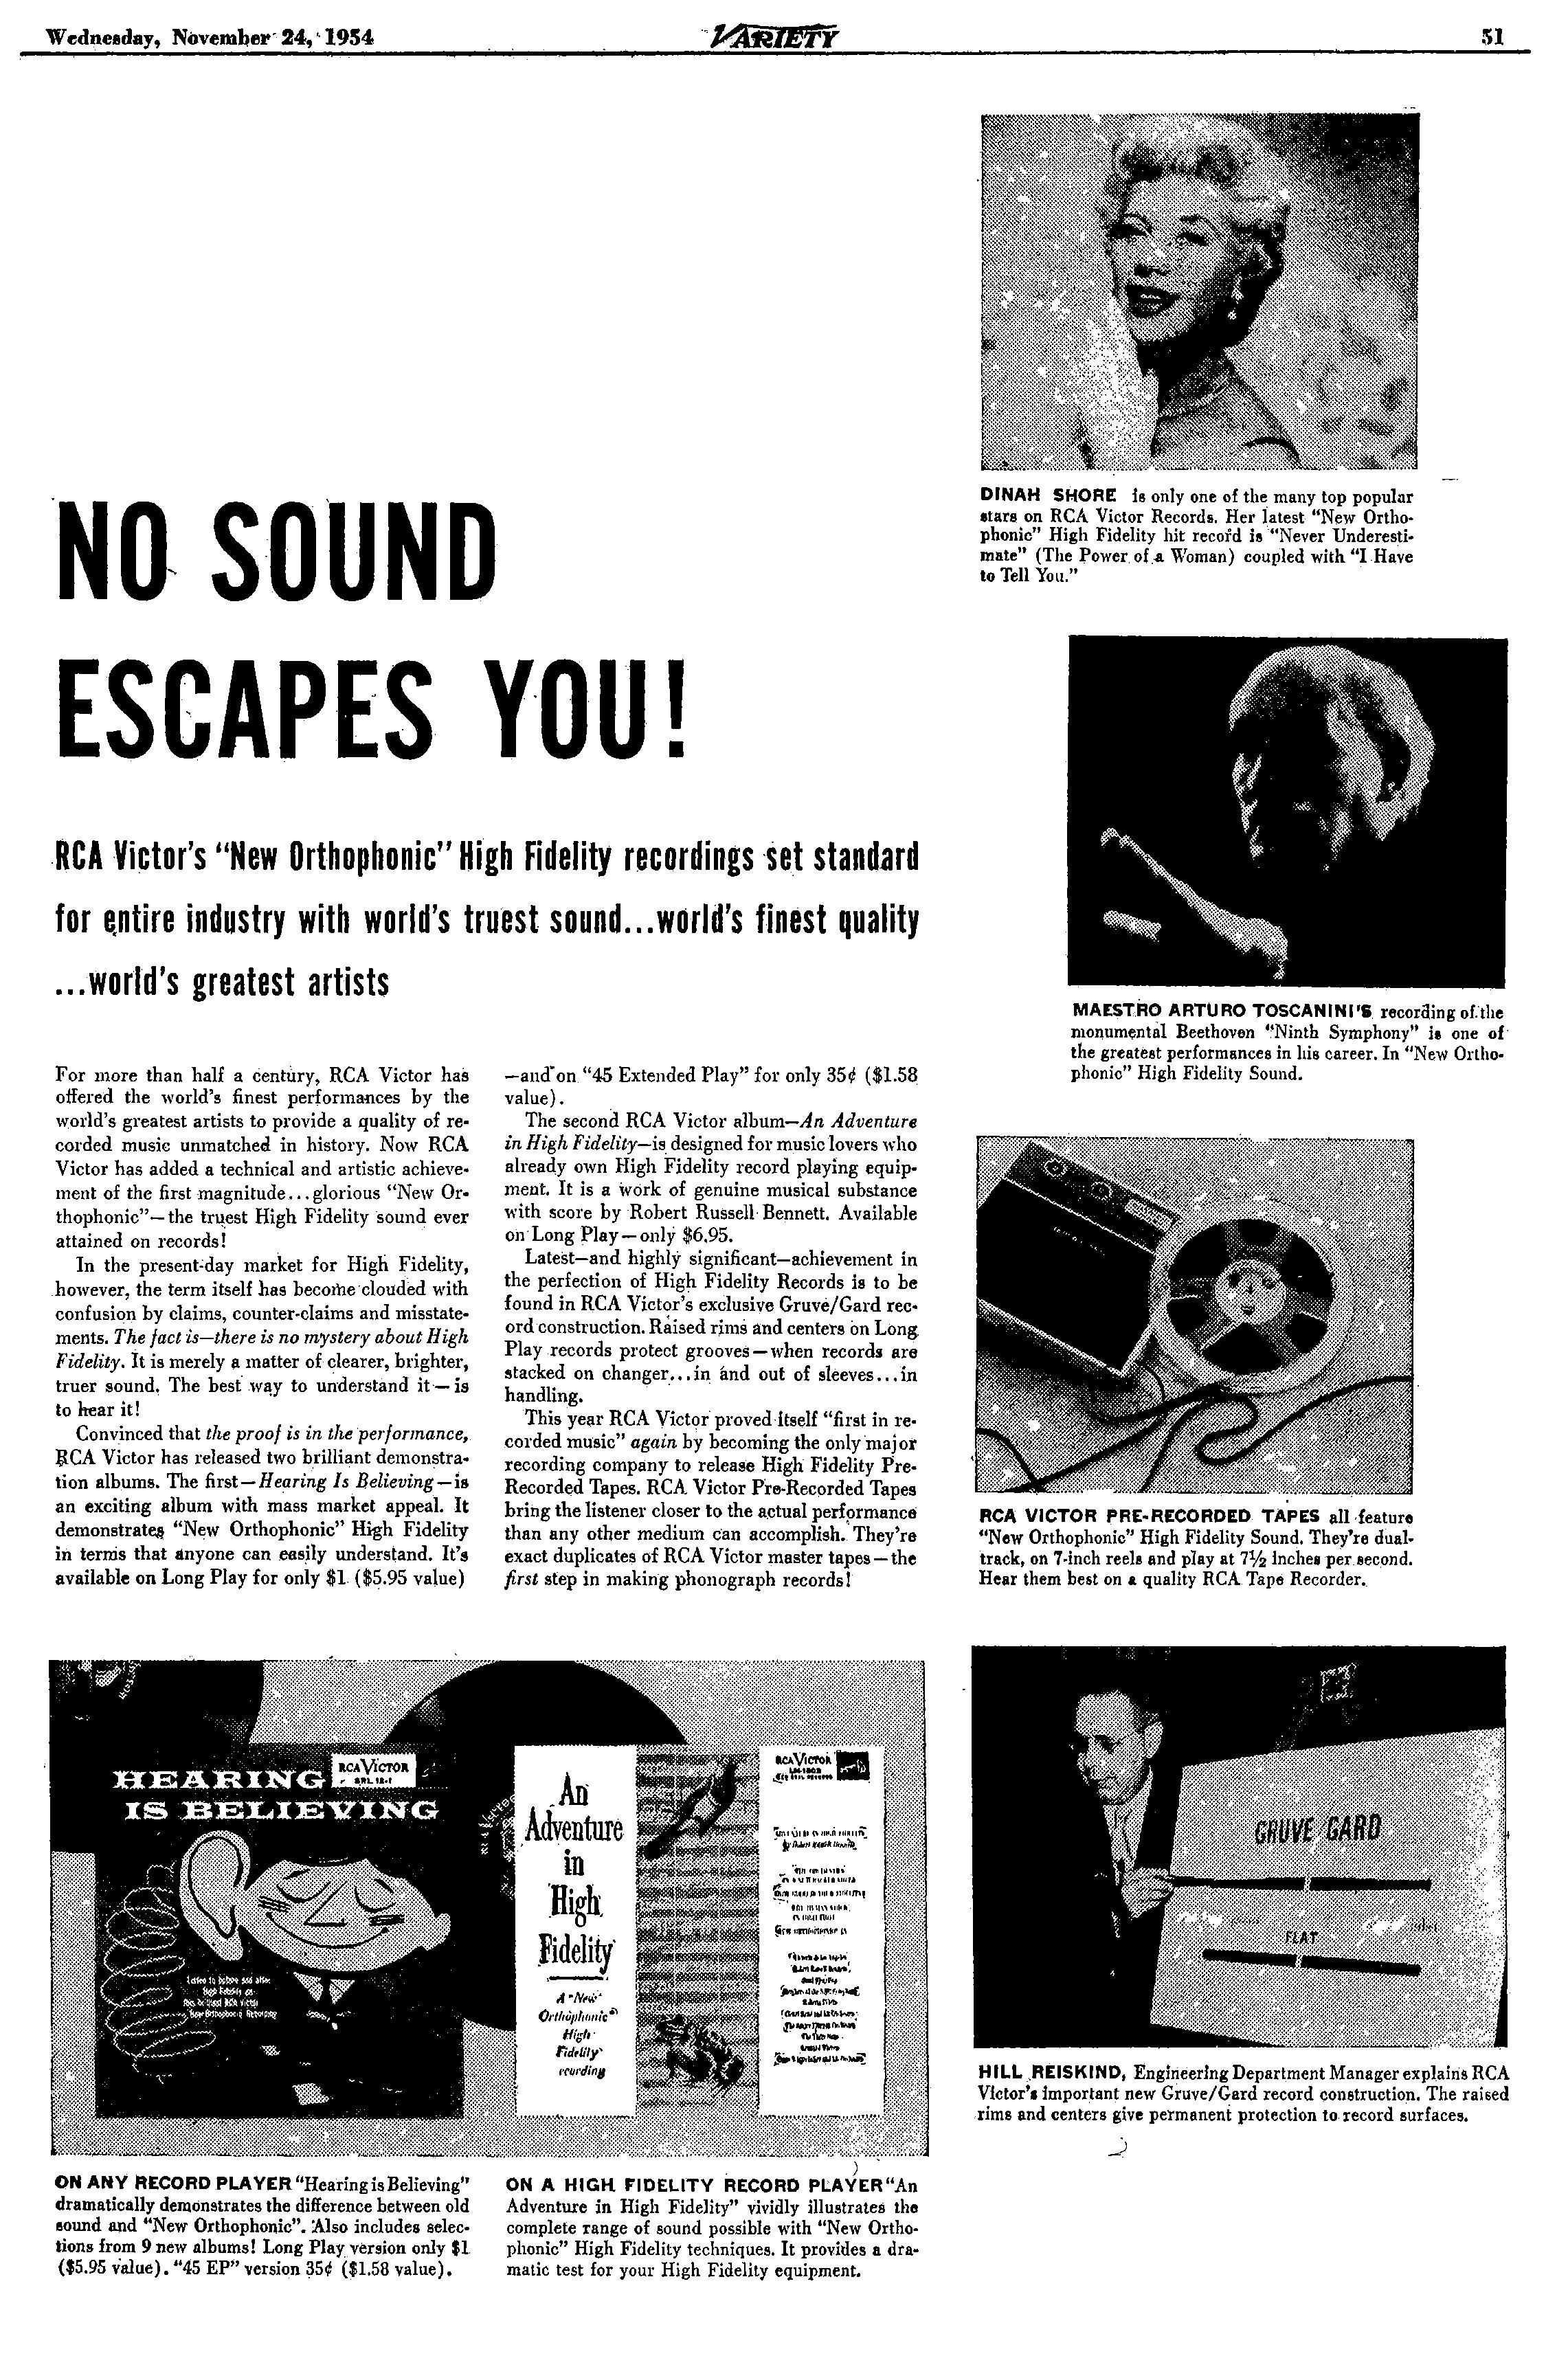 Variety196-1954-11_jp2.zip&file=variety196-1954-11_jp2%2fvariety196-1954-11_0266